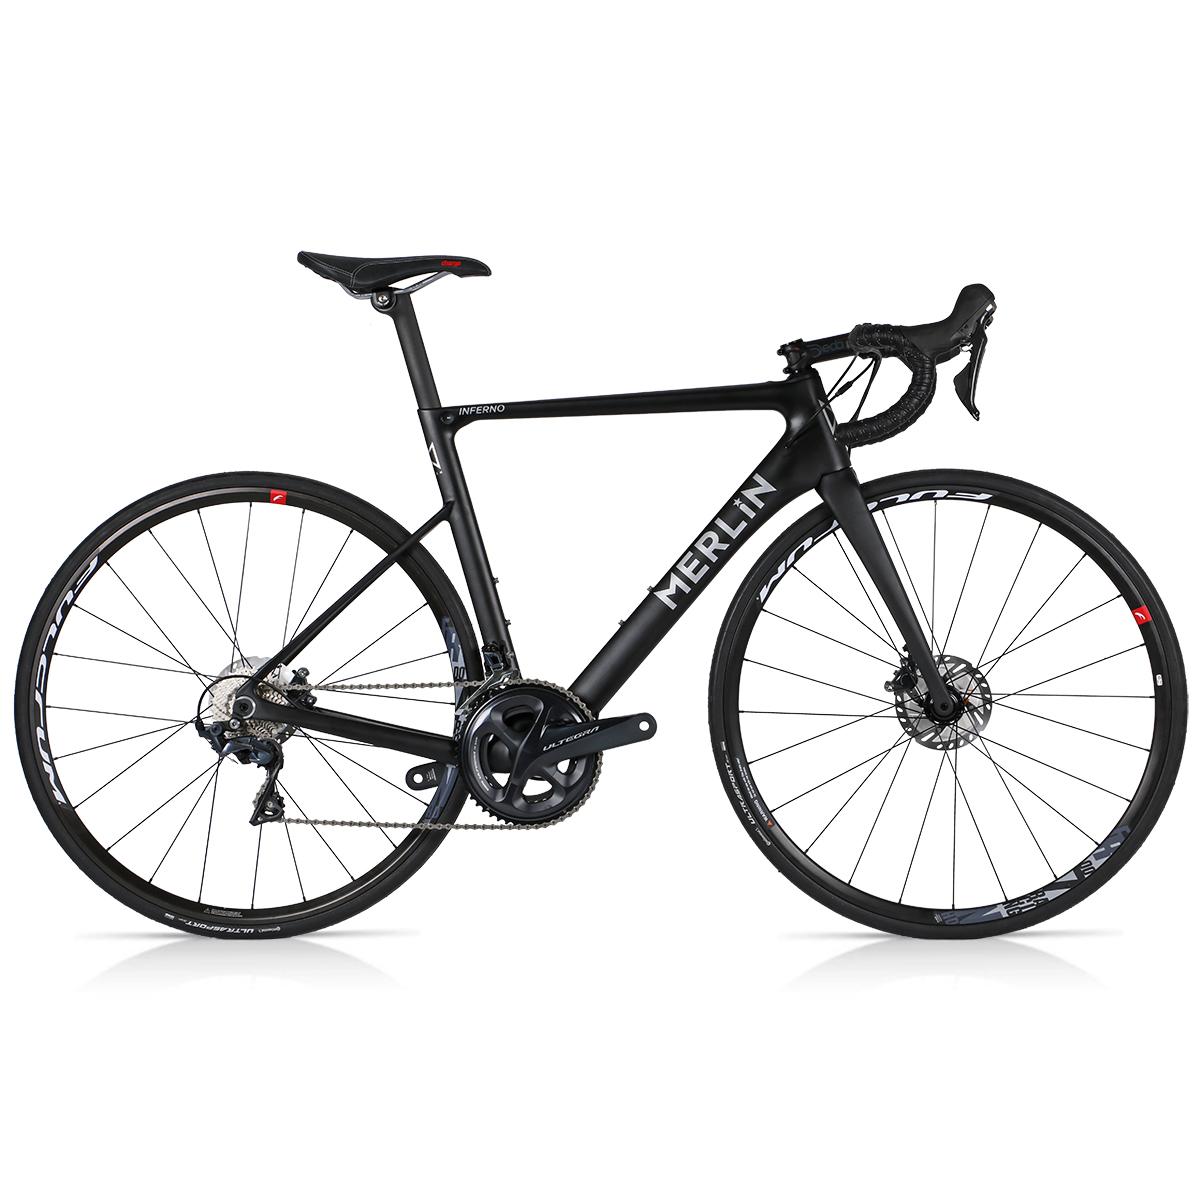 Merlin Inferno Ultegra Disc Carbon Road Bike